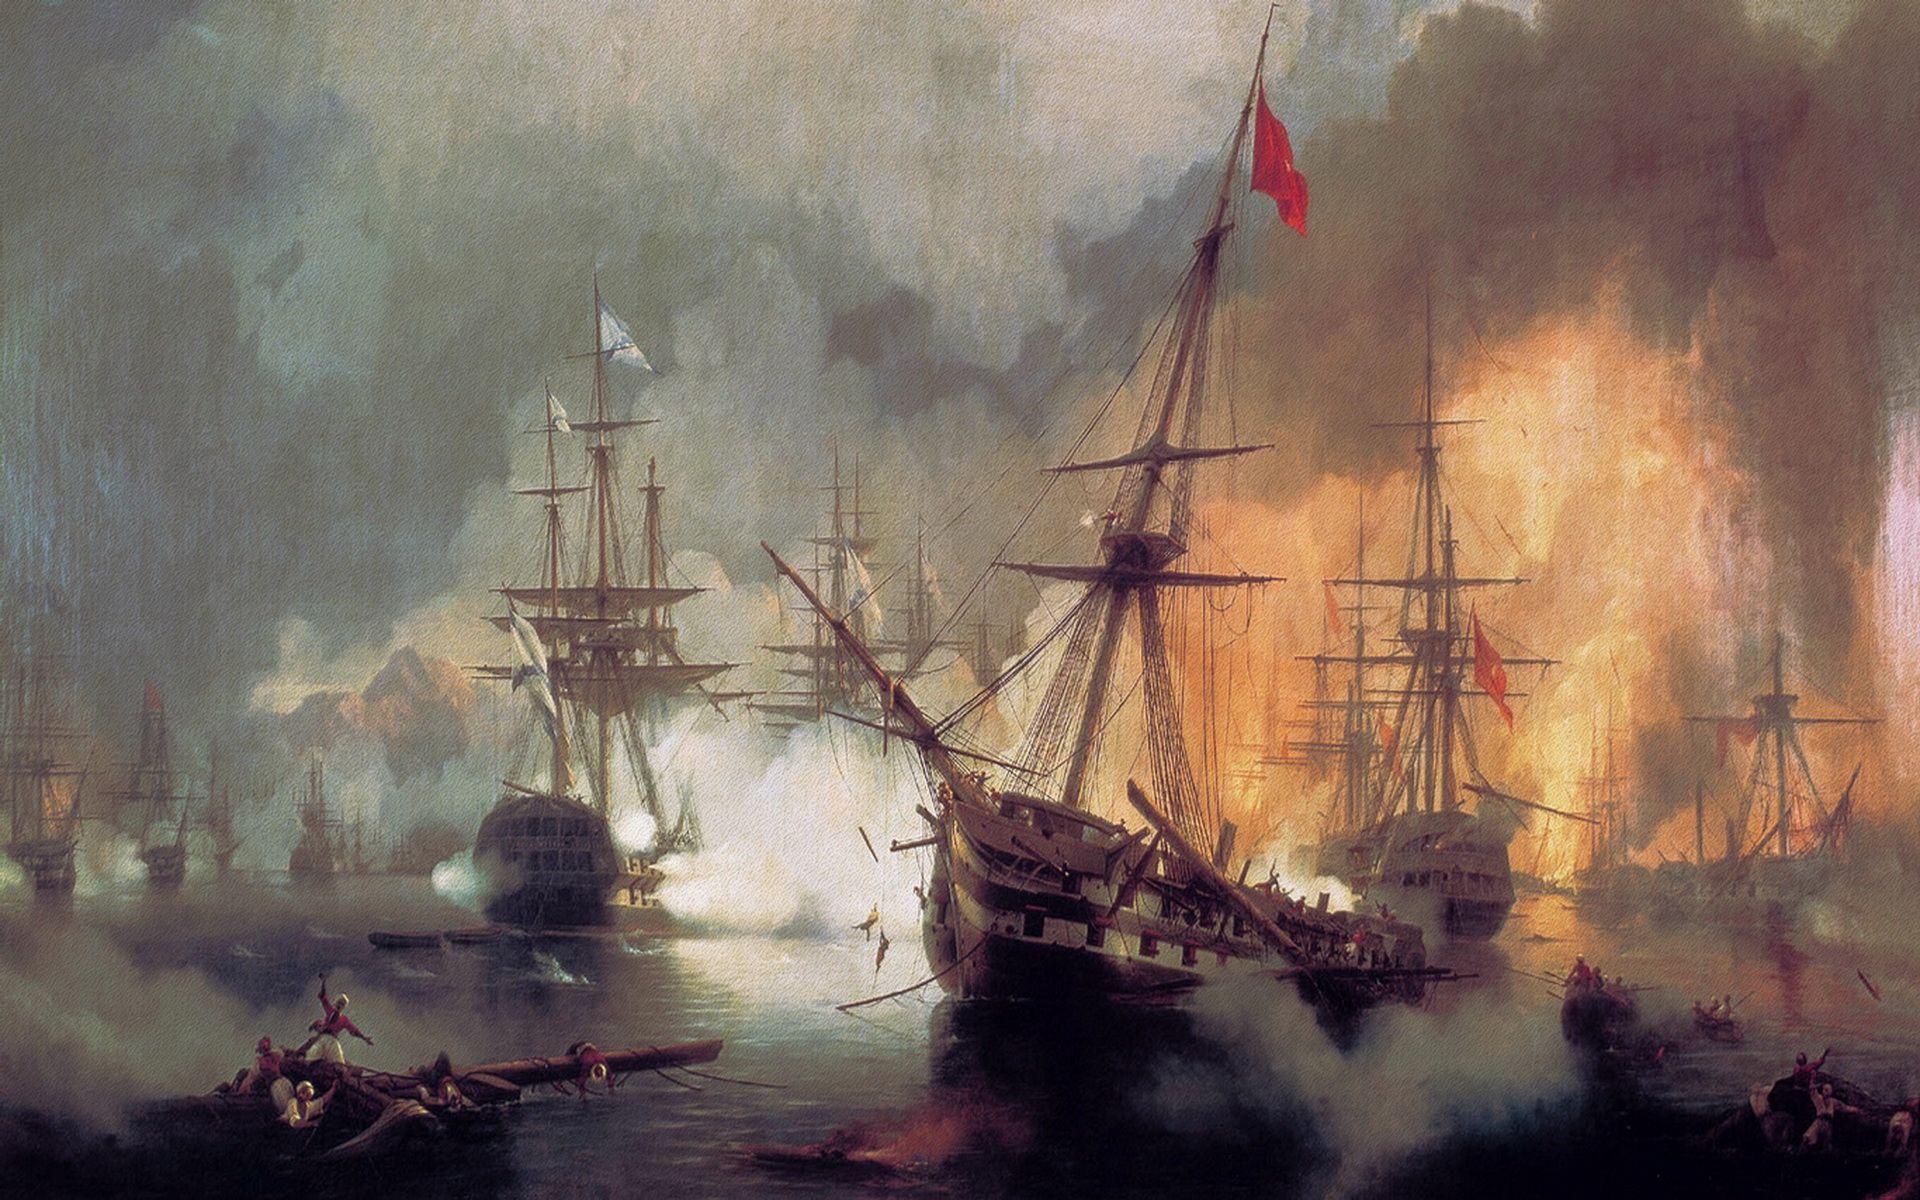 Battle Pirates Fire Oil Painting Hd Wallpapers Desktop